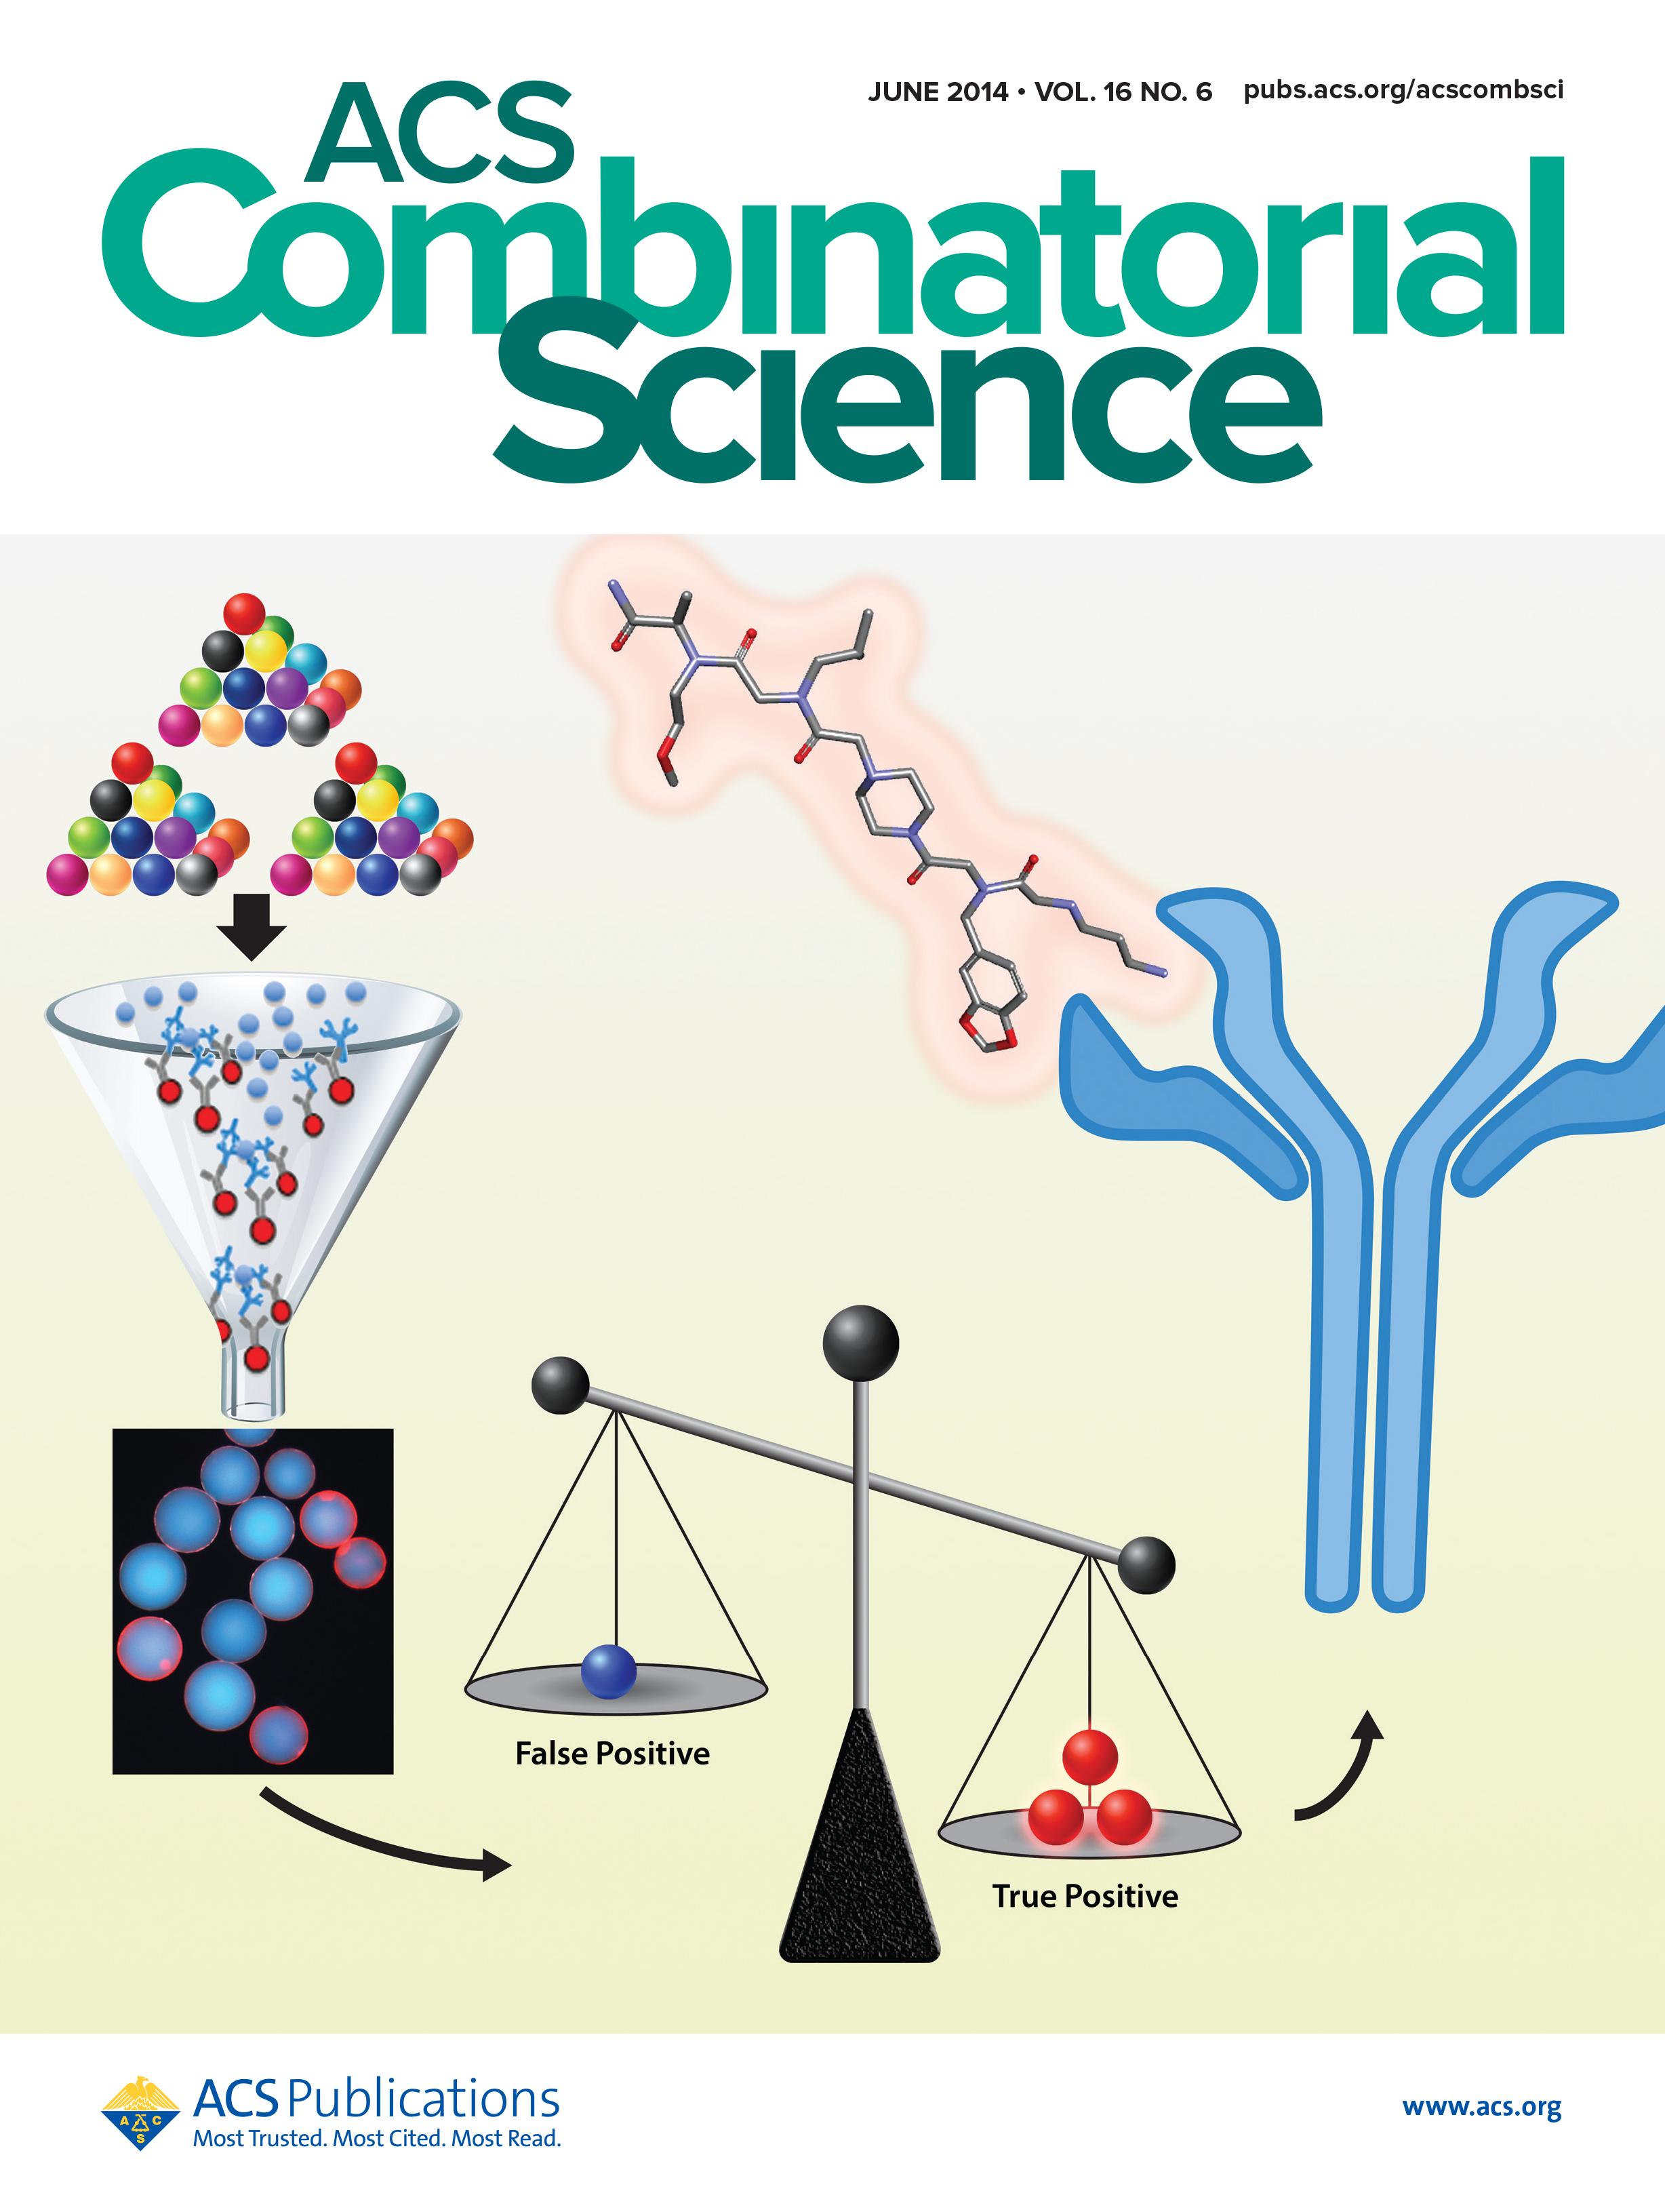 Polymer-Supported Stereoselective Synthesis of Tetrahydrobenzopyrazino-thiadiazinone Dioxides via N-Sulfonyl Iminiums